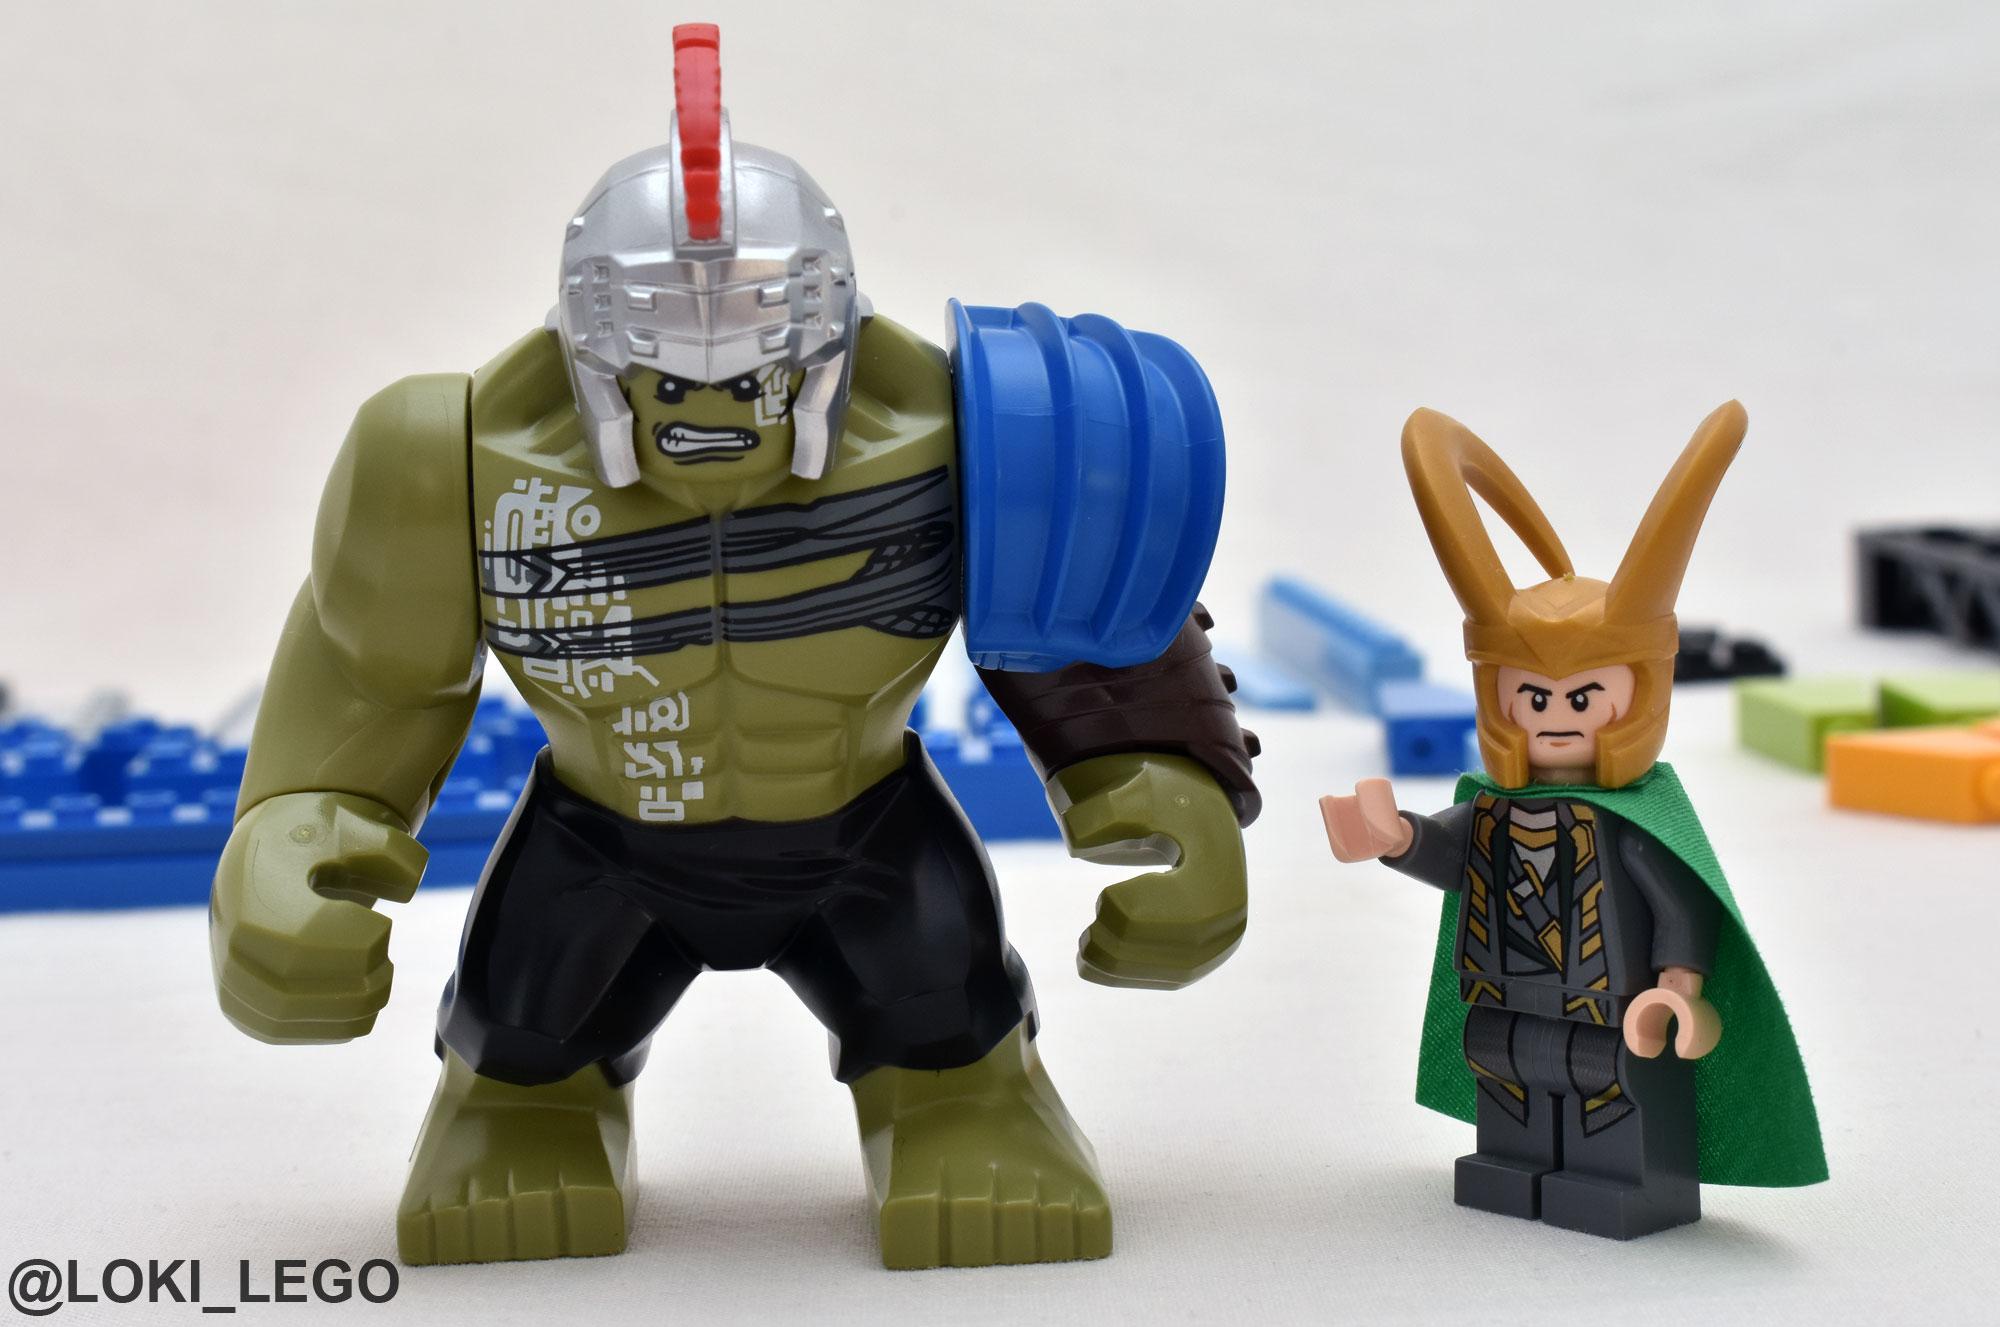 lego avengers hulk vs thor - photo #21